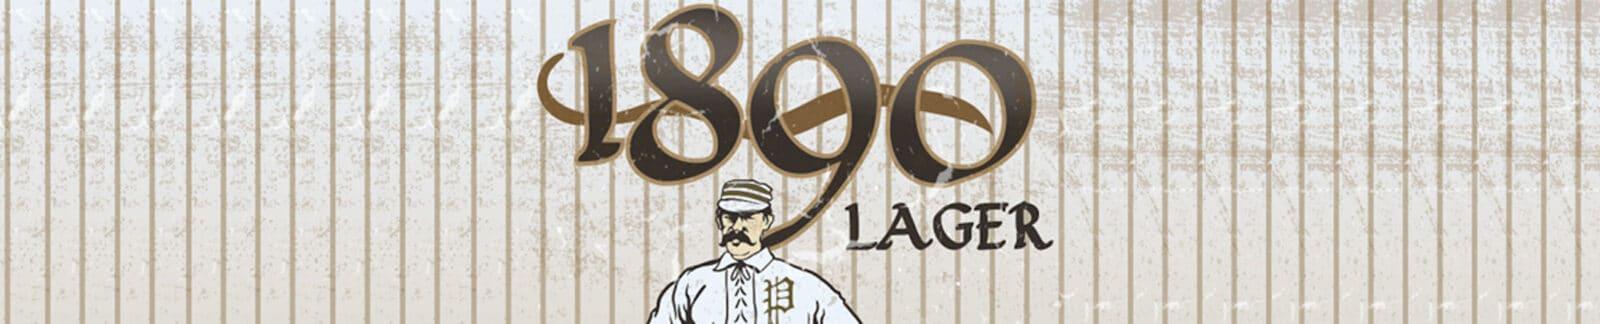 Burgh'ers Brewing – 1890 Lager - header